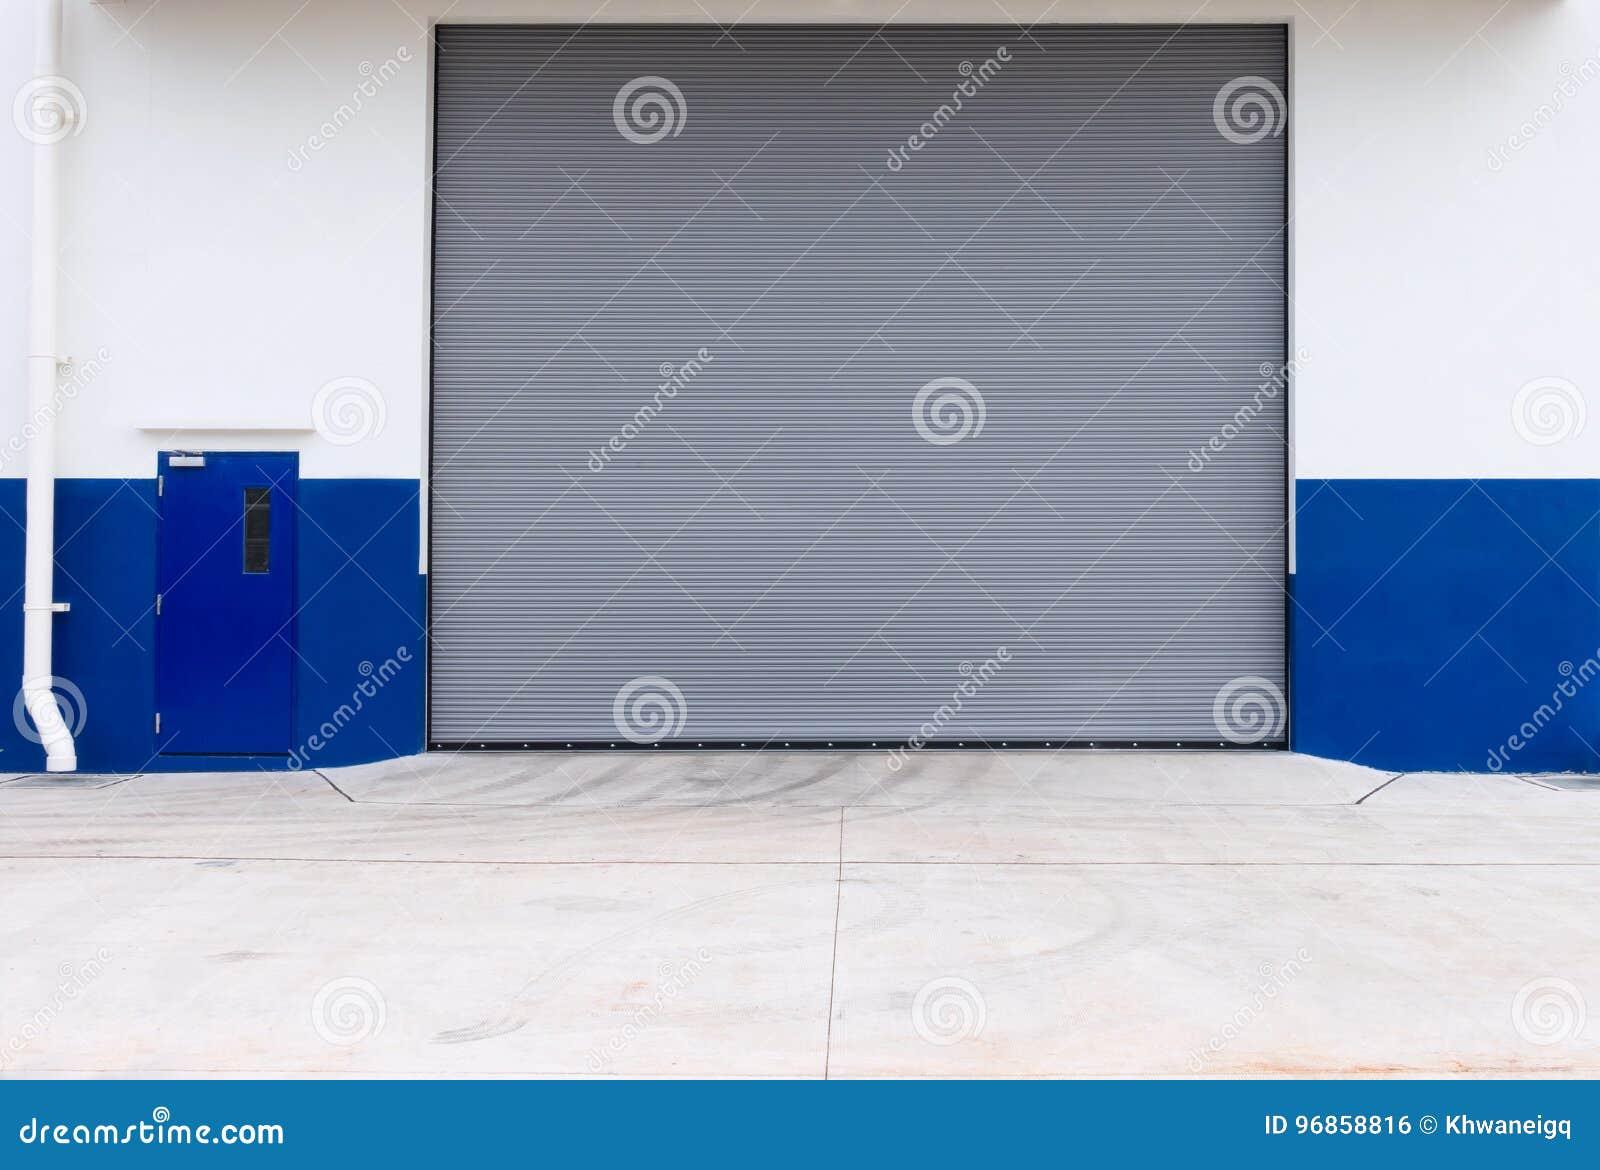 Automatic Roller Shutter Door Of Storage Warehouse Stock